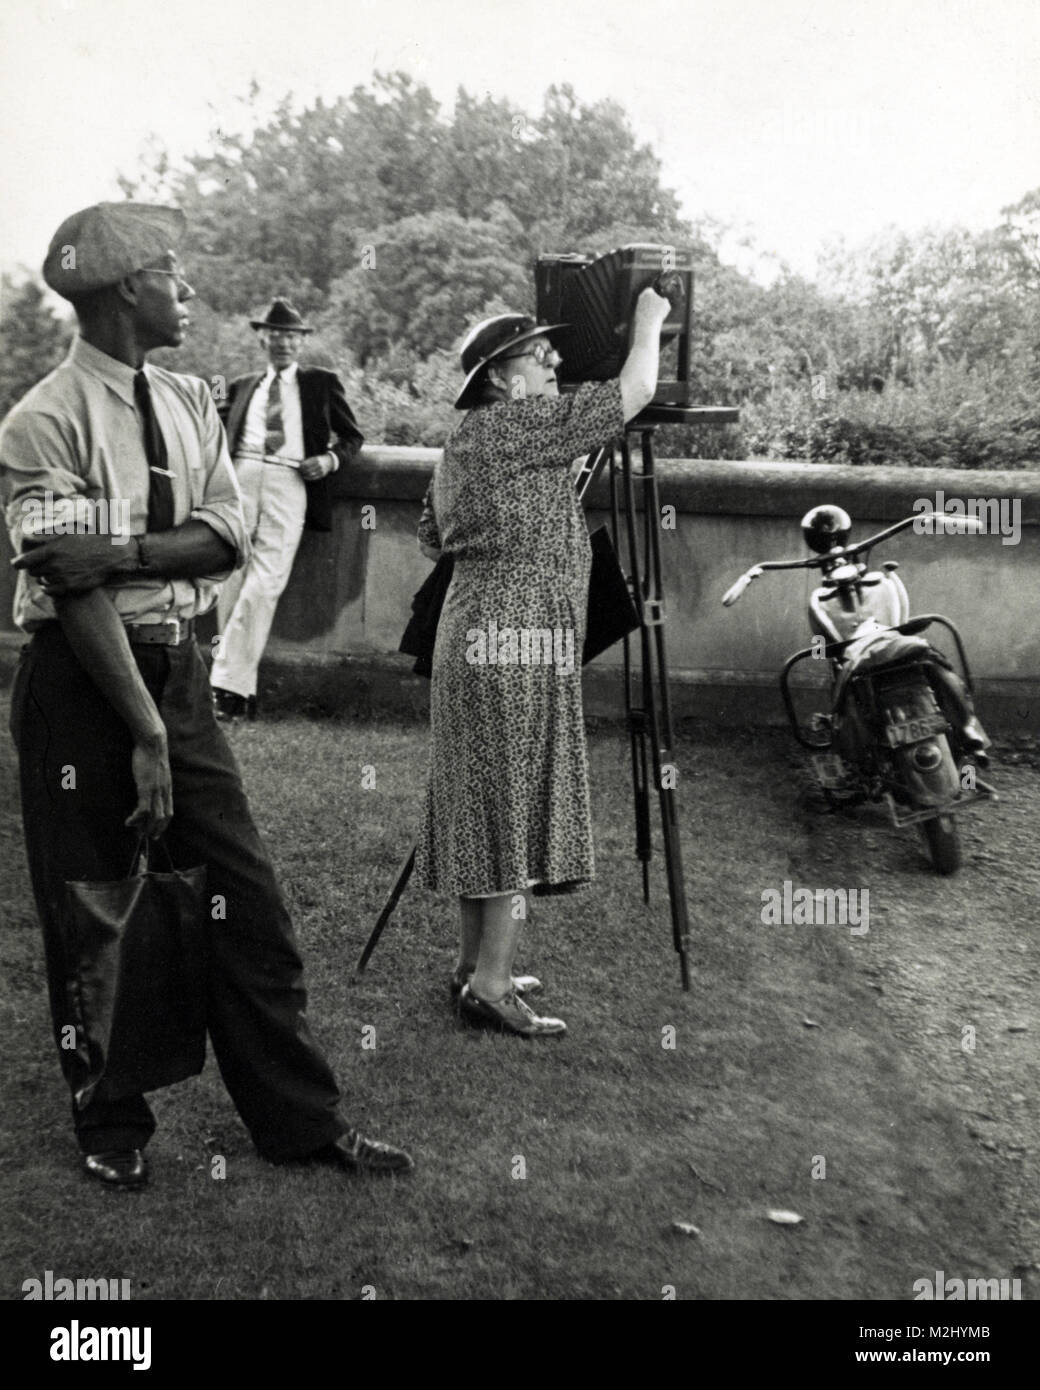 Frances Johnston Photographing the Biltmore Estate, 1938 - Stock Image